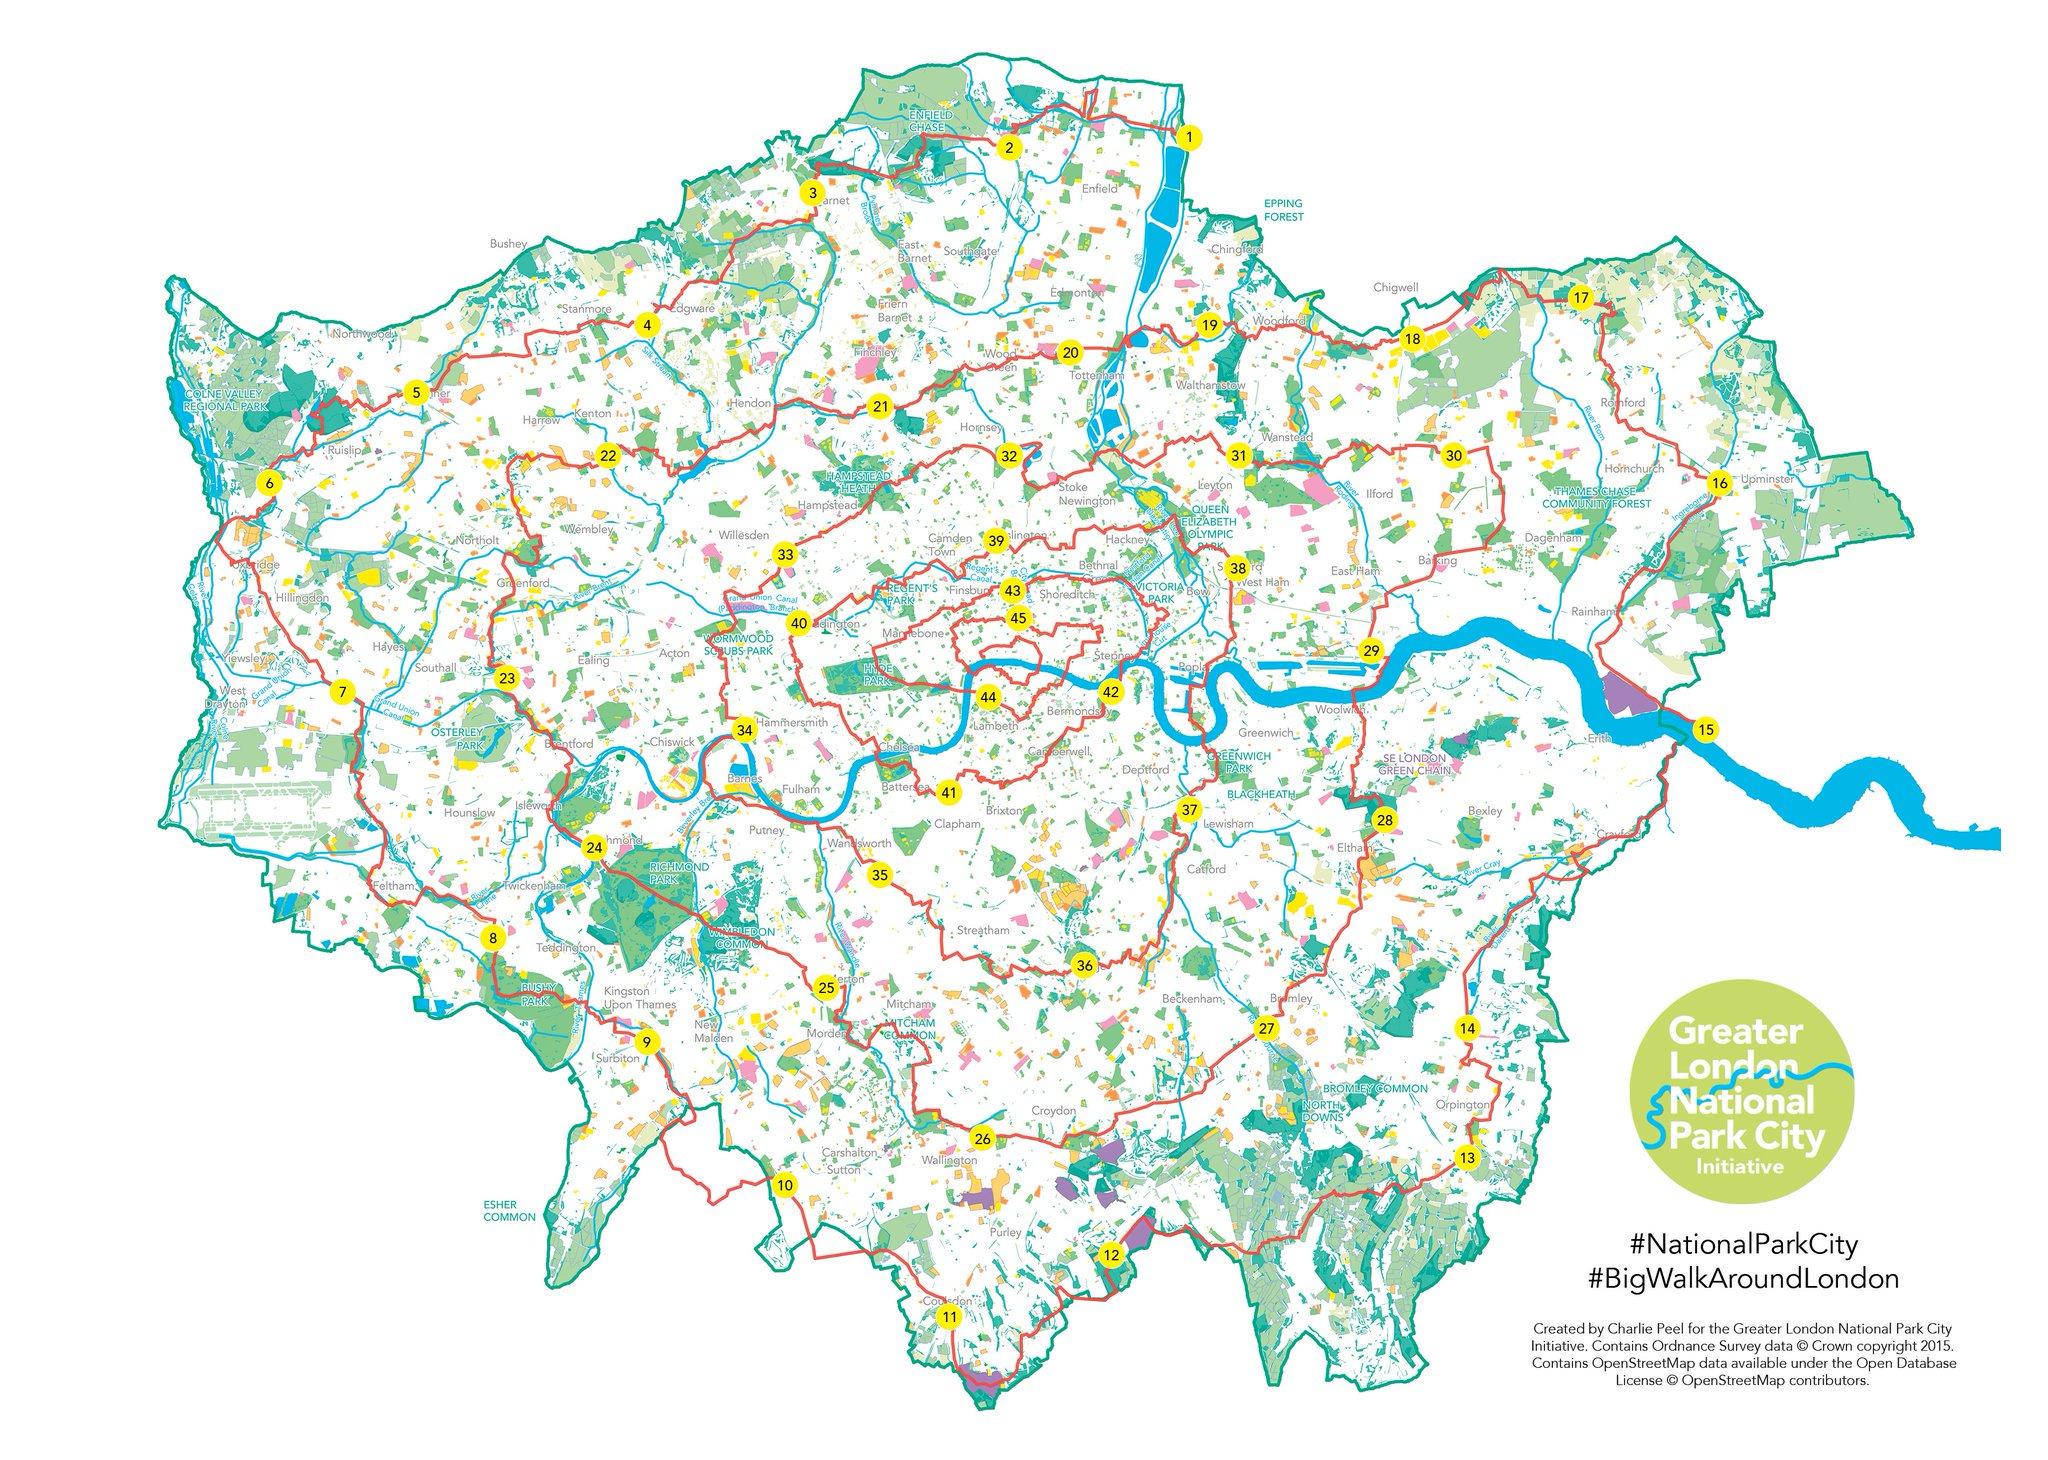 Big Walk Around London Greater London National Park City